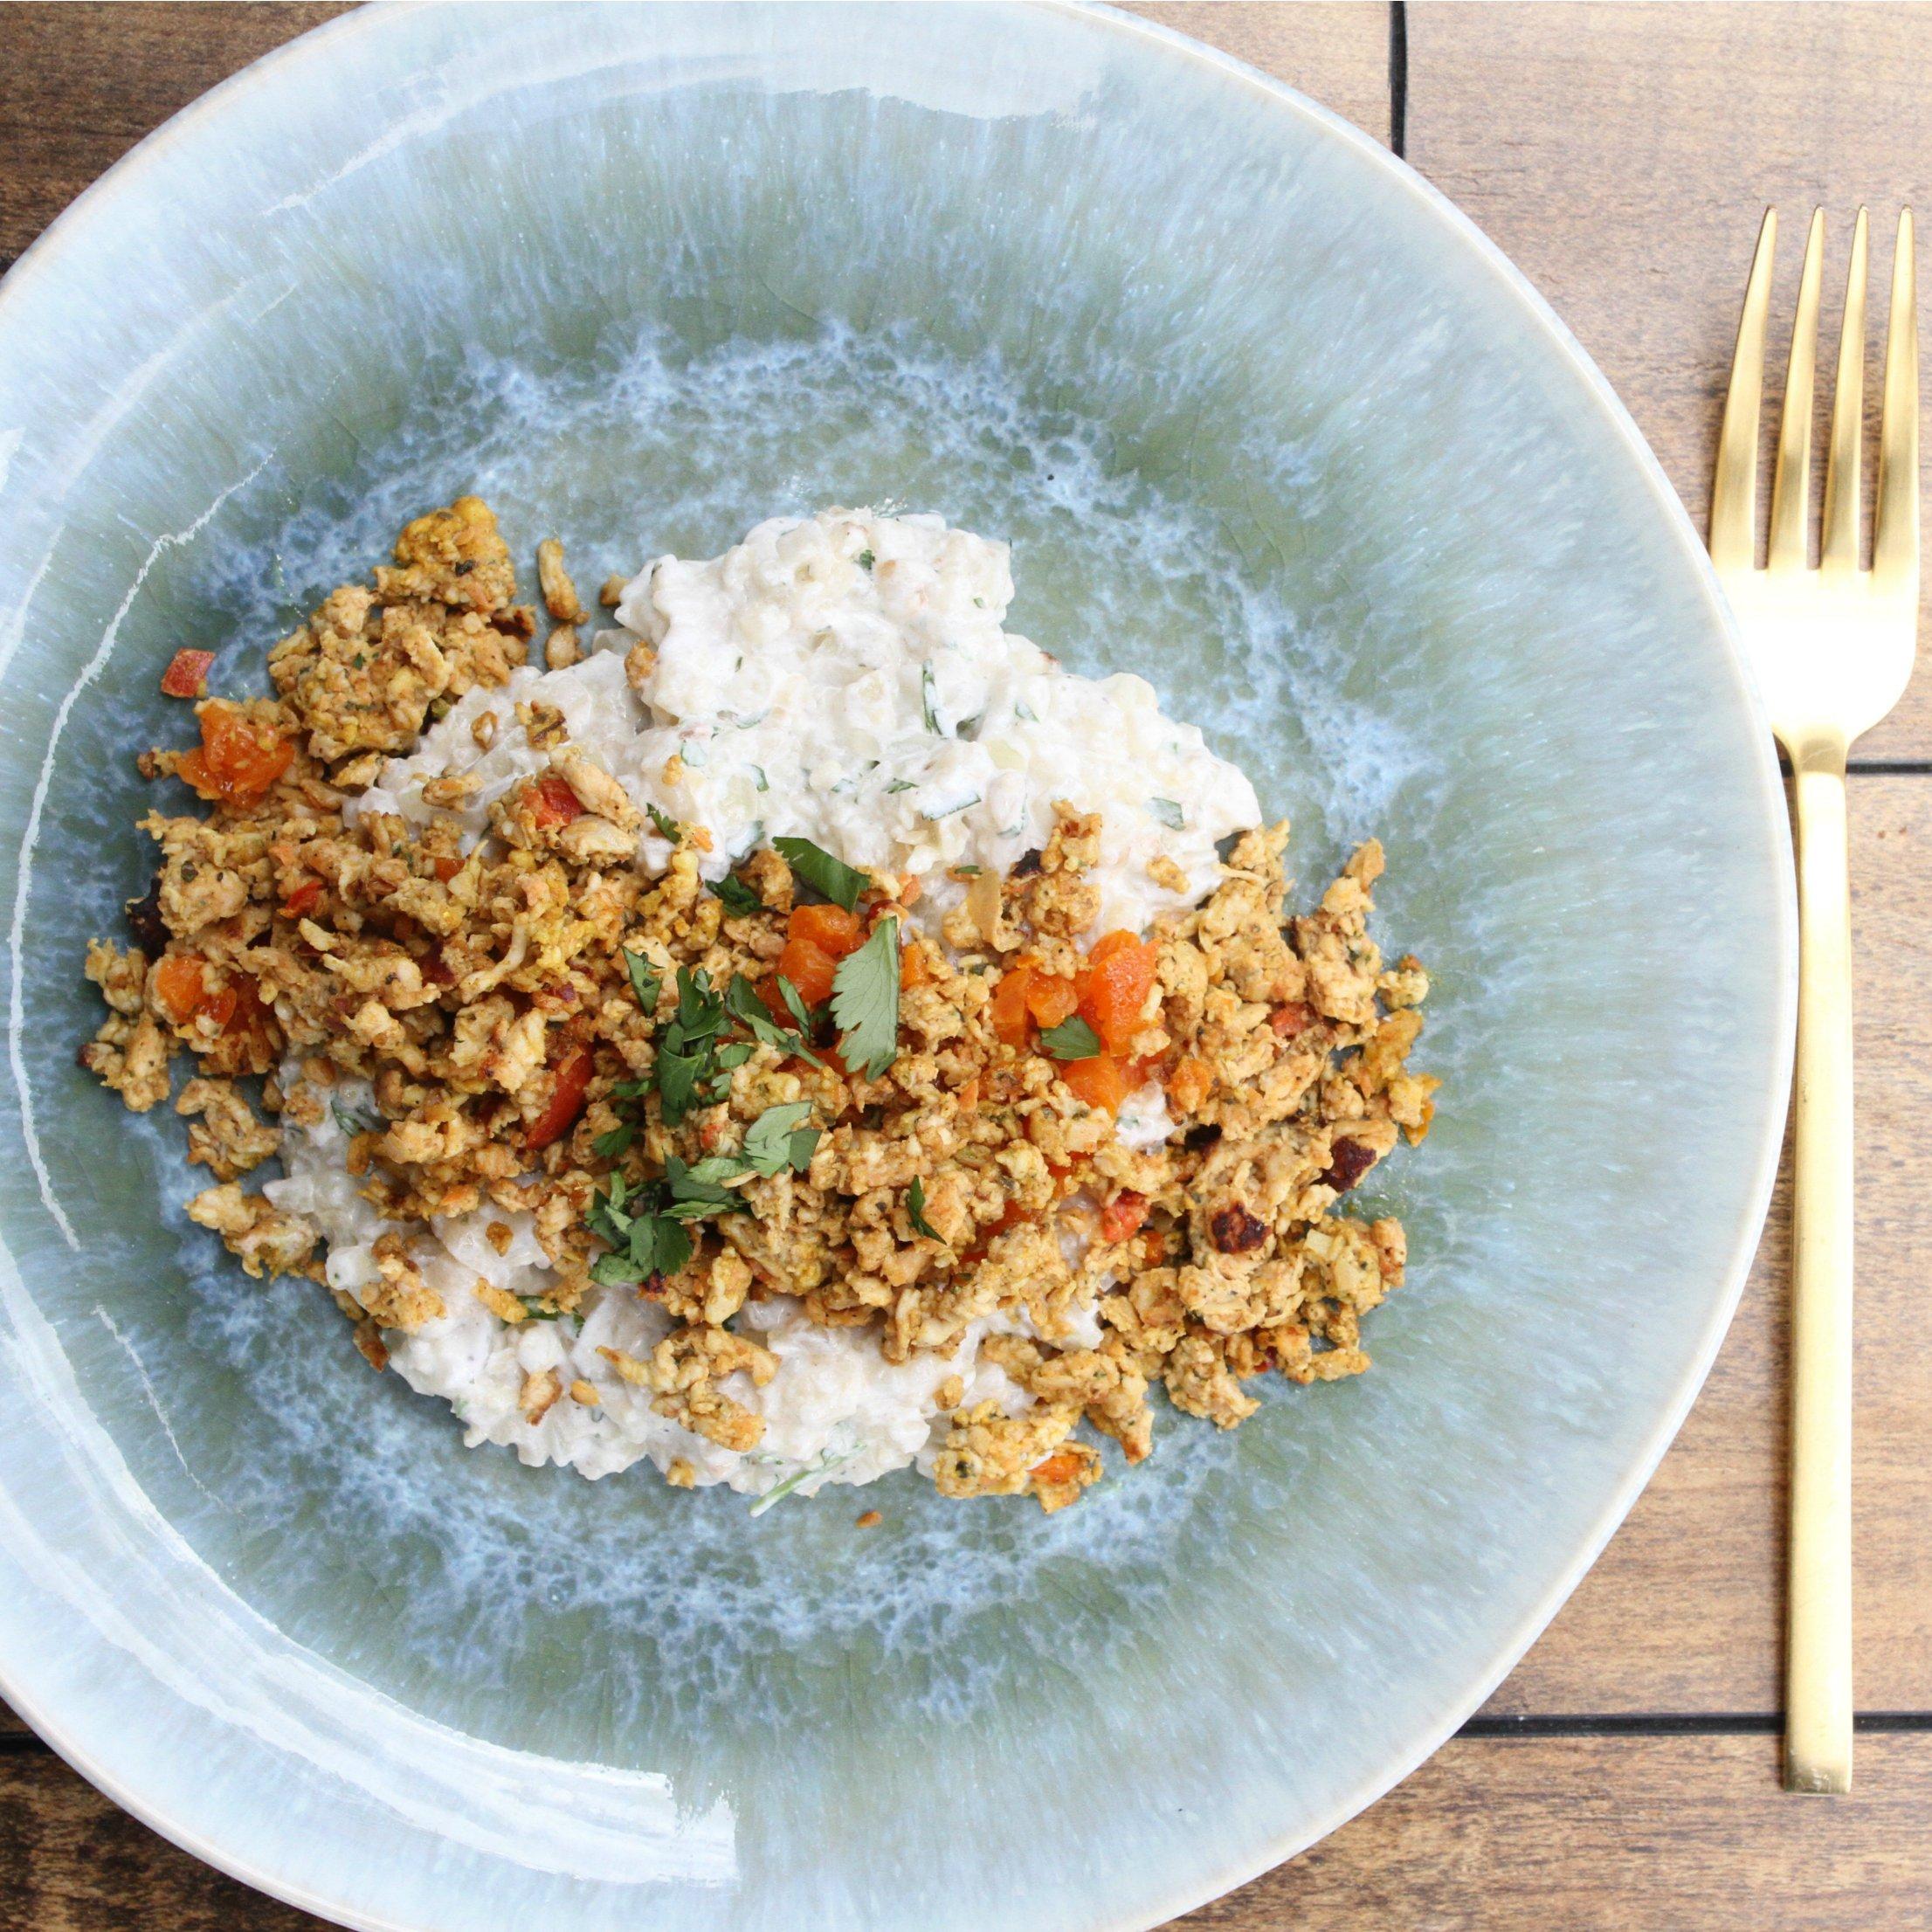 Pete's Paleo Meals, 6 Servings, Cauliflower Rice Dinners